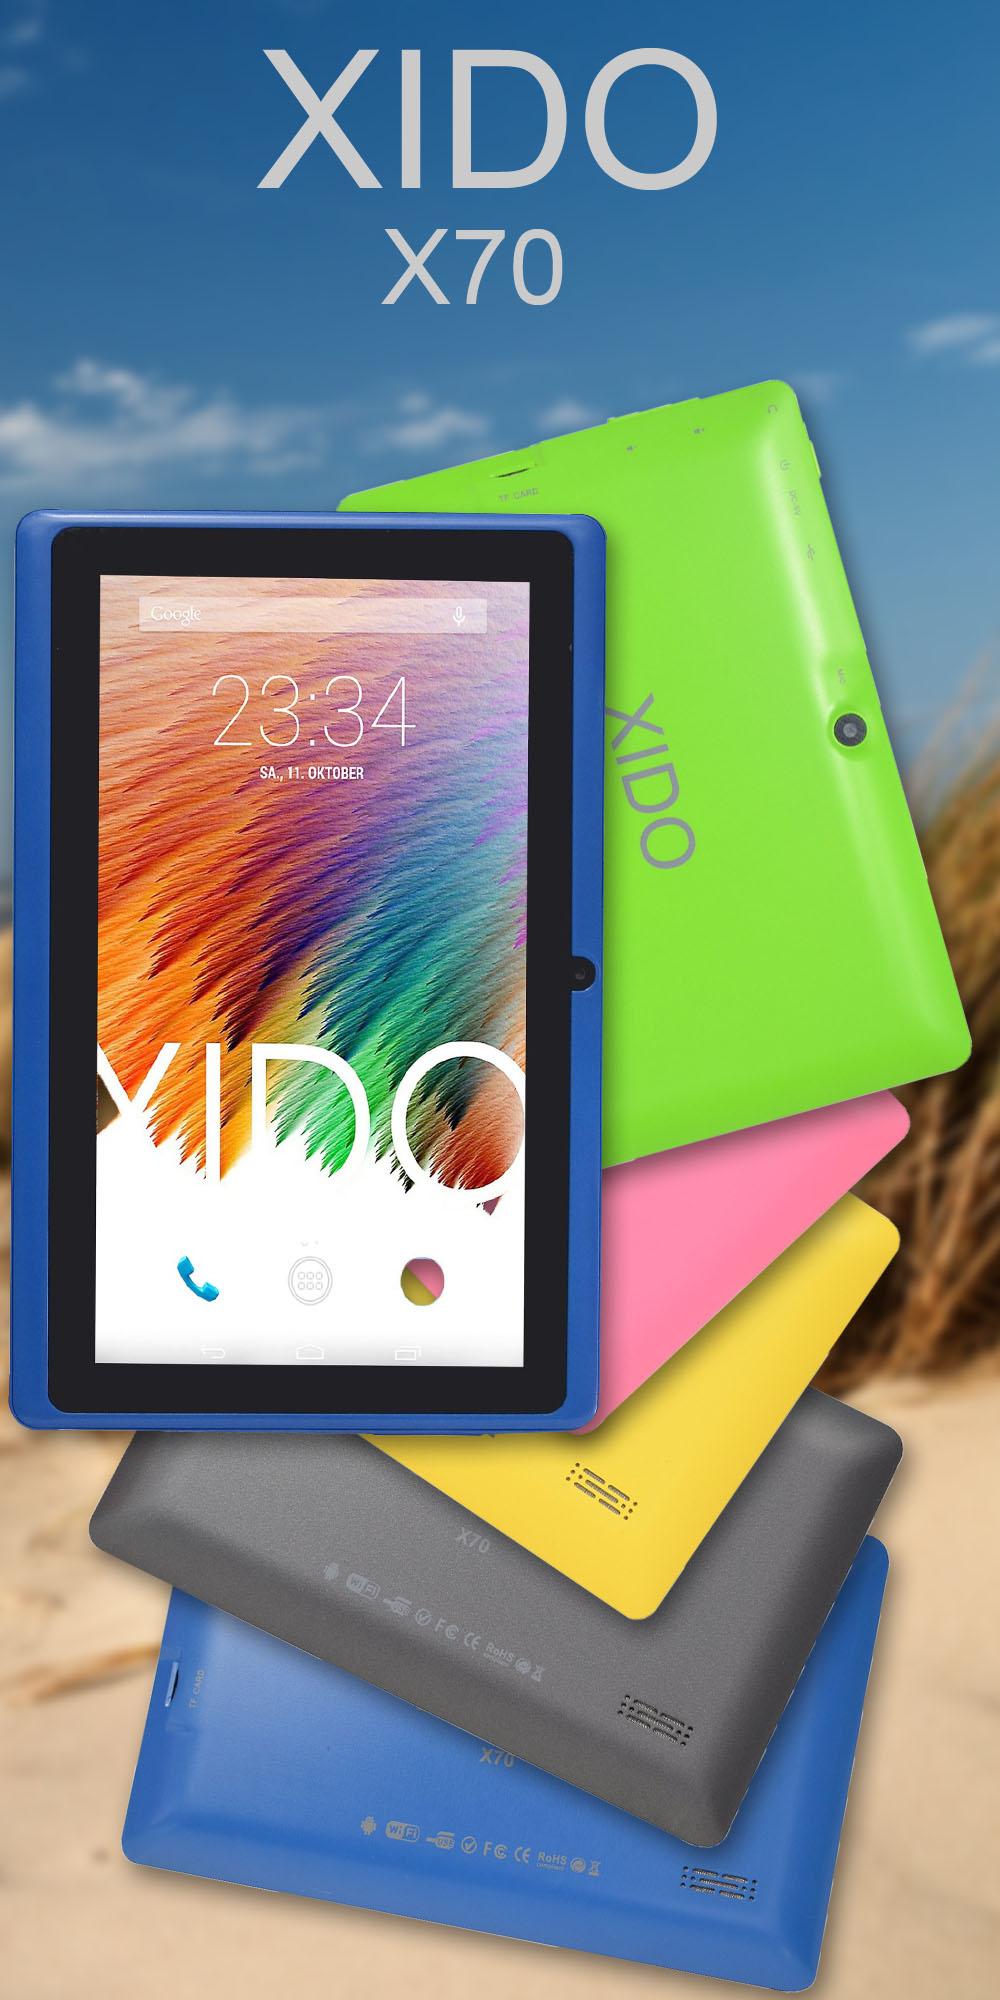 XIDO X70 Tablet